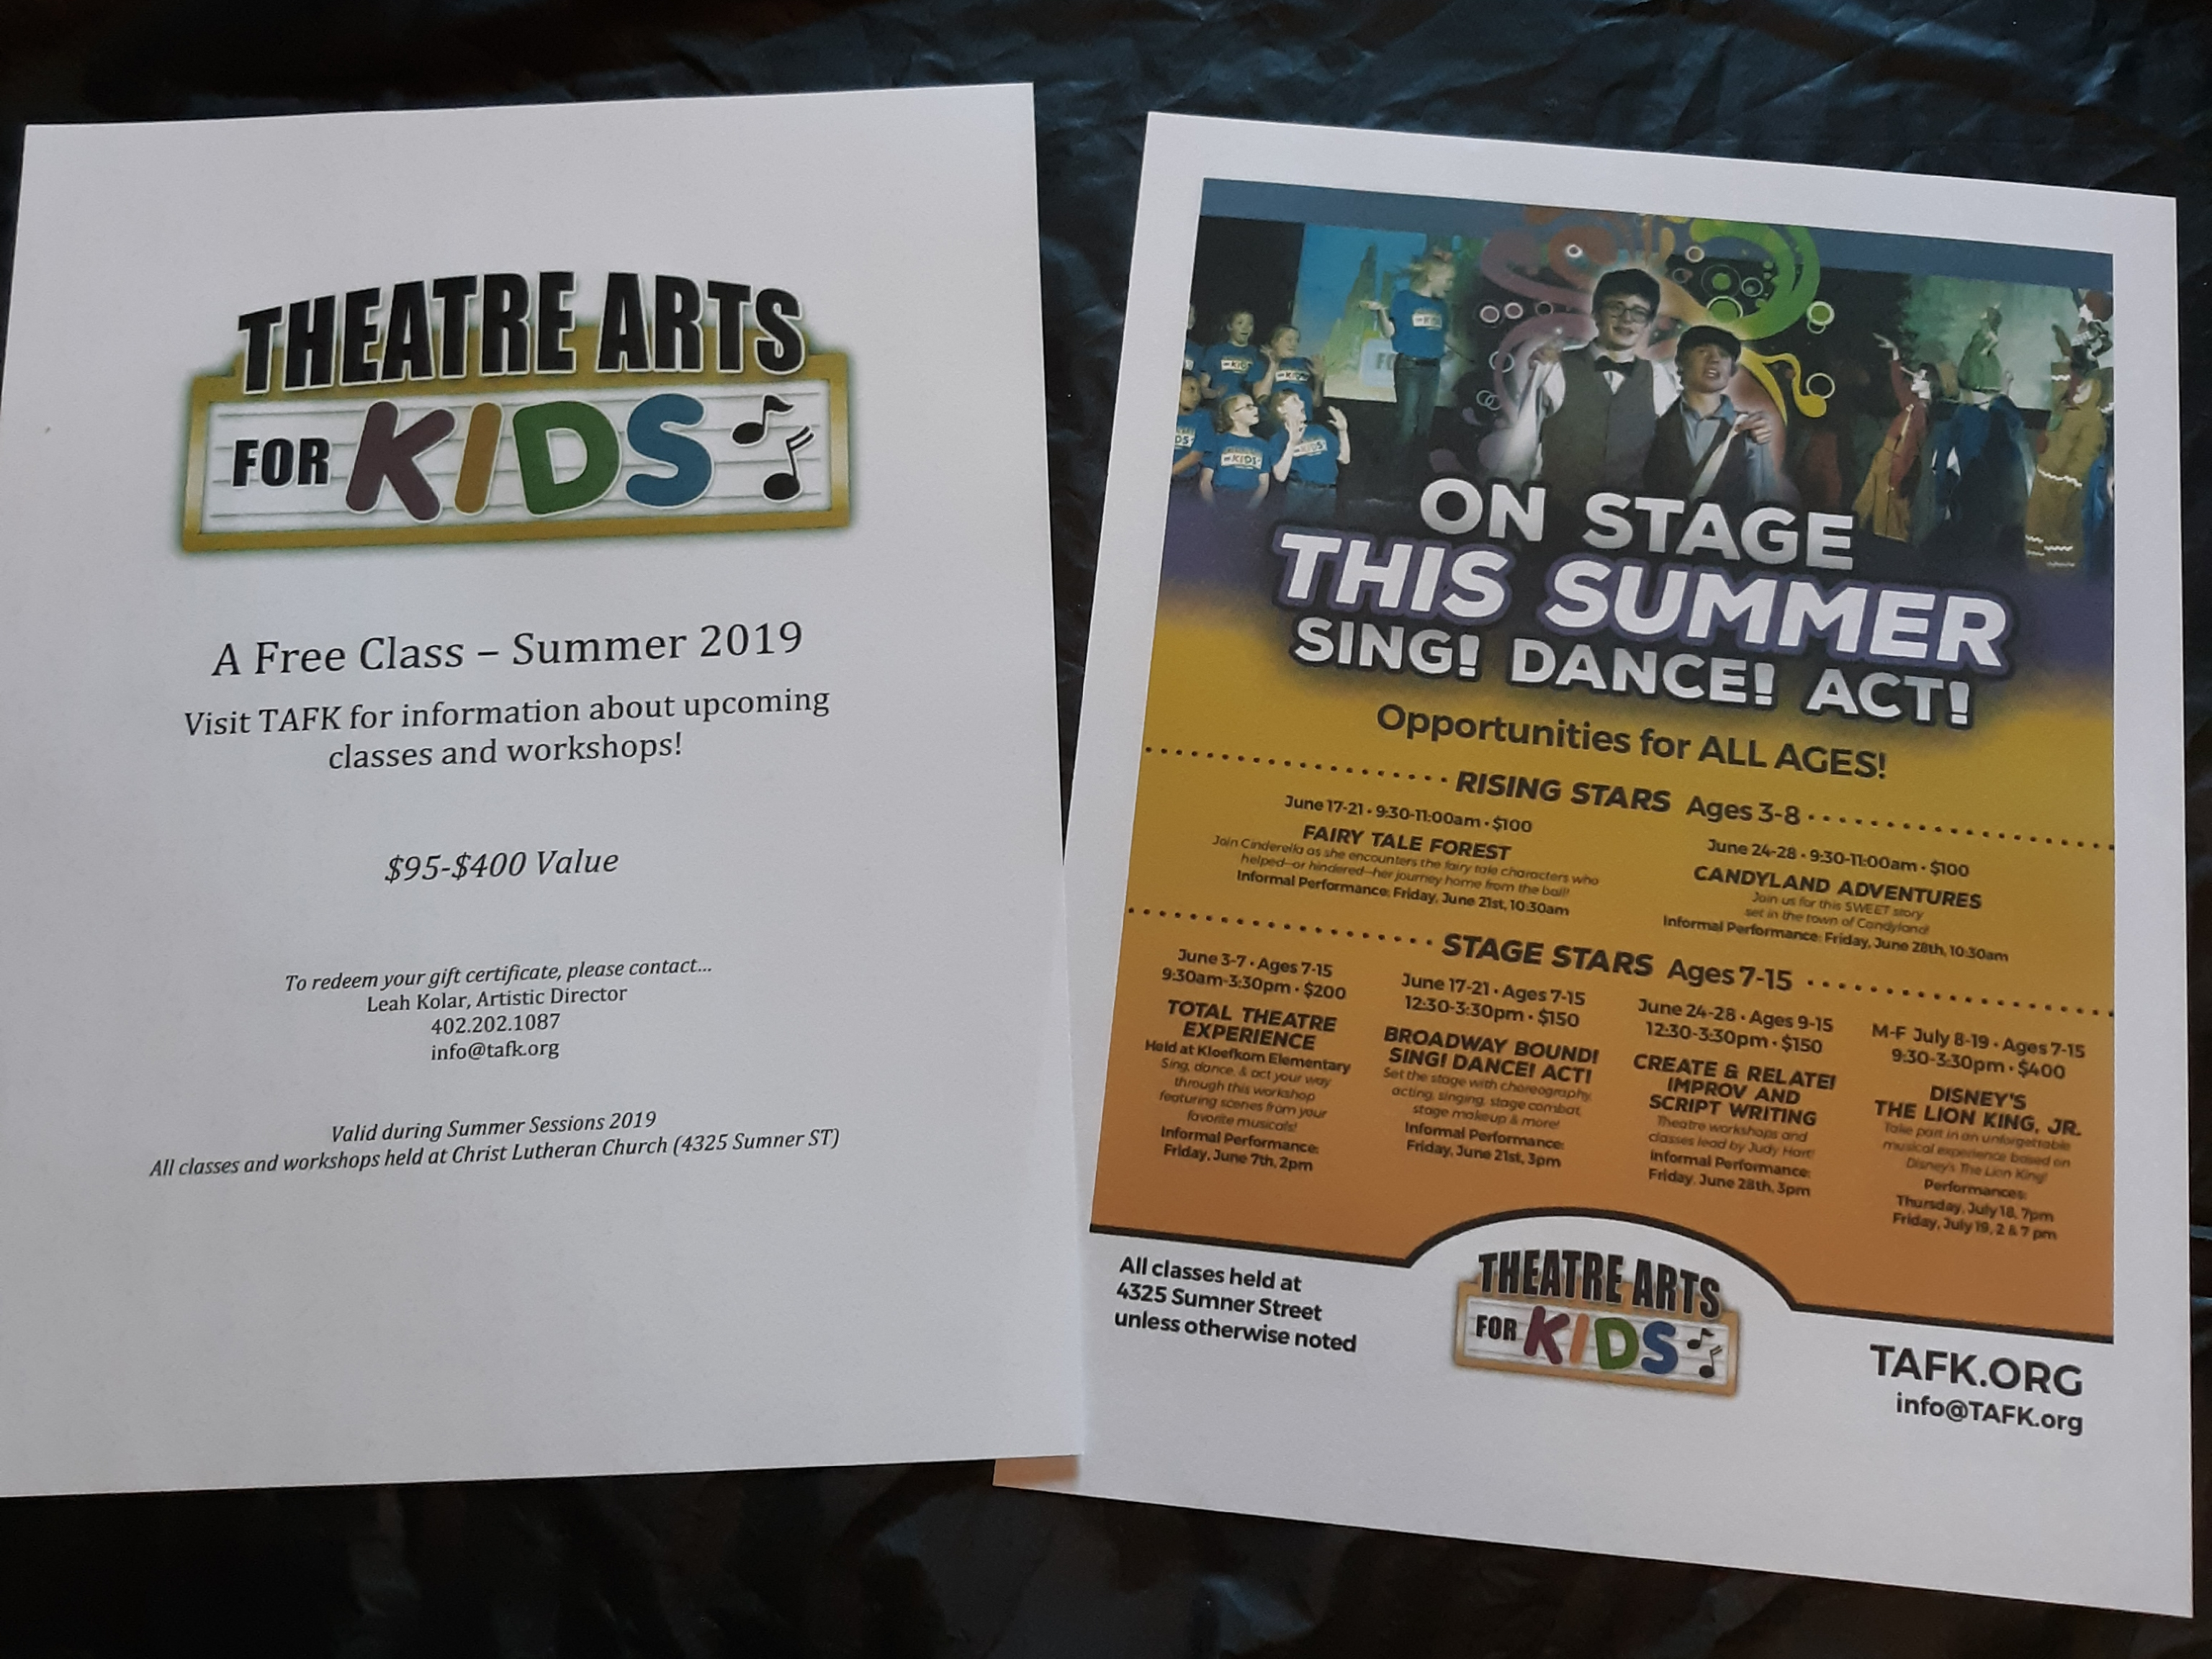 Basket #4 - Theatre Arts for Kids